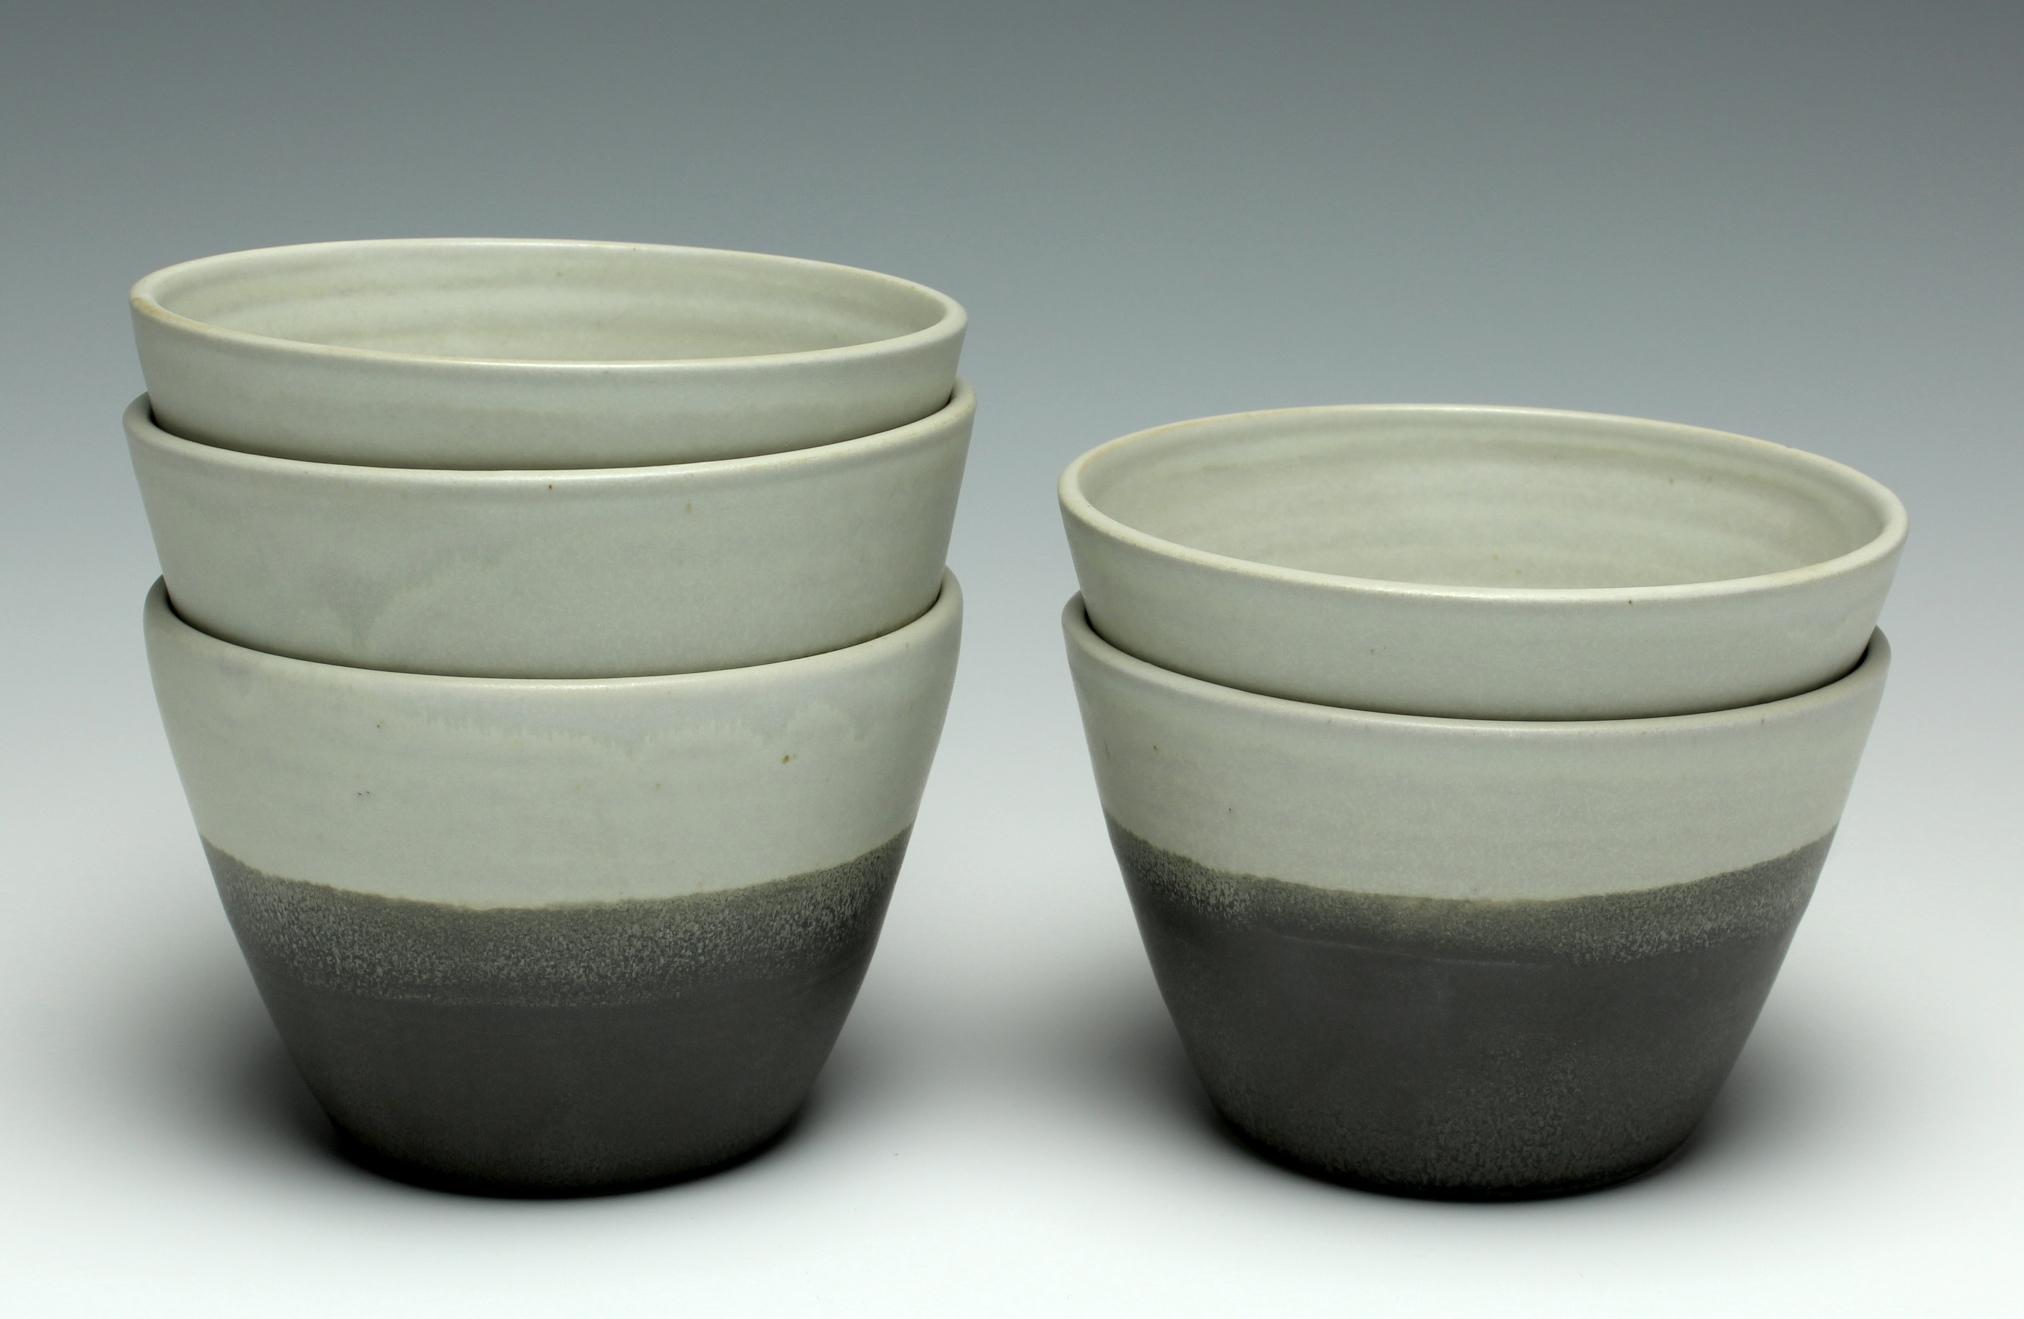 Bowls_Sorbet.JPG